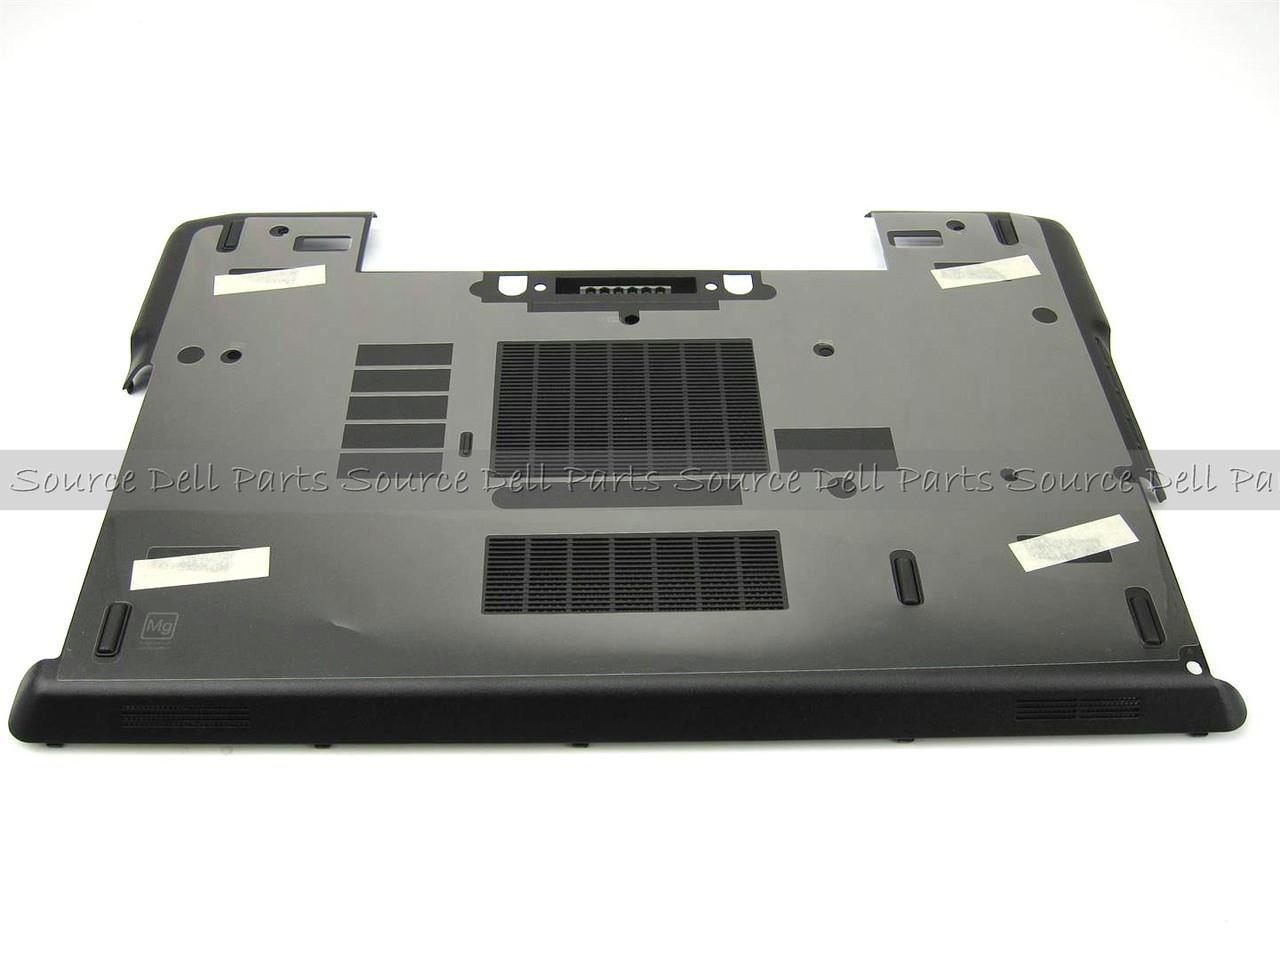 Toshiba Satellite M645 M645D M640 M640D disassembly